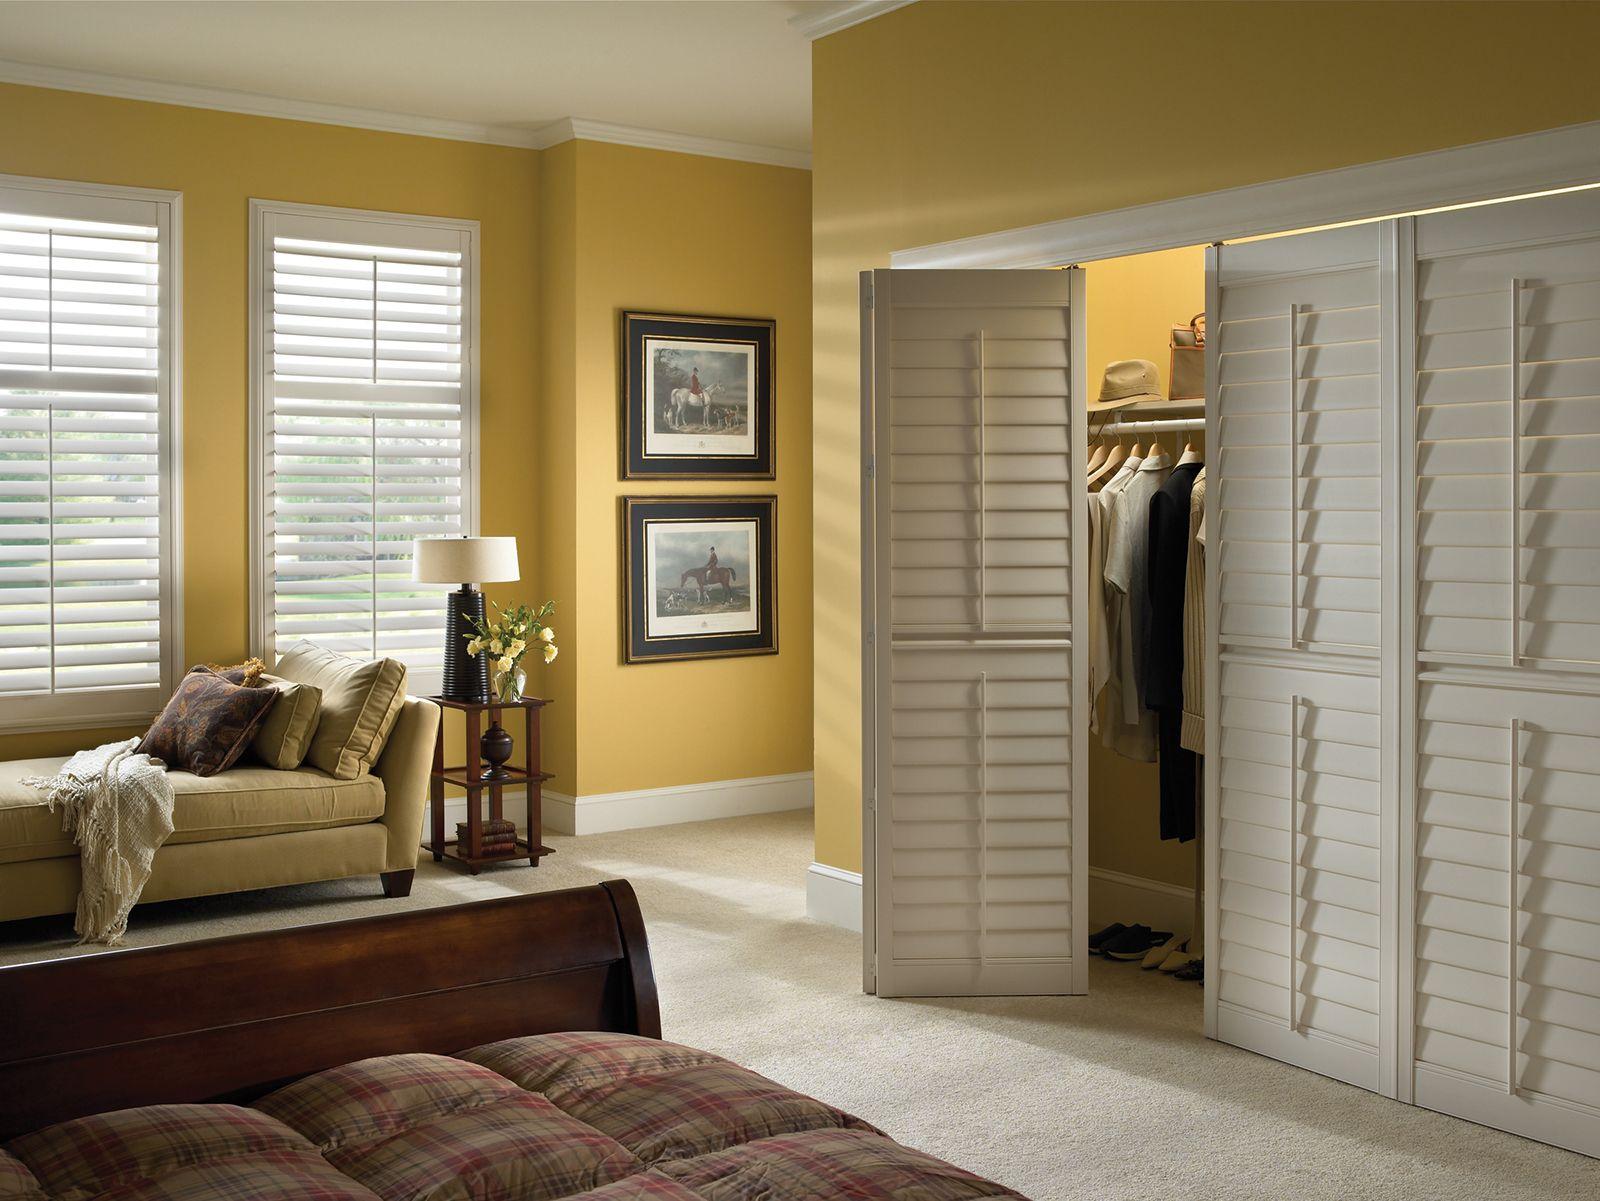 Pearl • Bi-fold closet doors • 3½ inch louver • Trim Frame • Deluxe Divider Rail • Tilt Bar